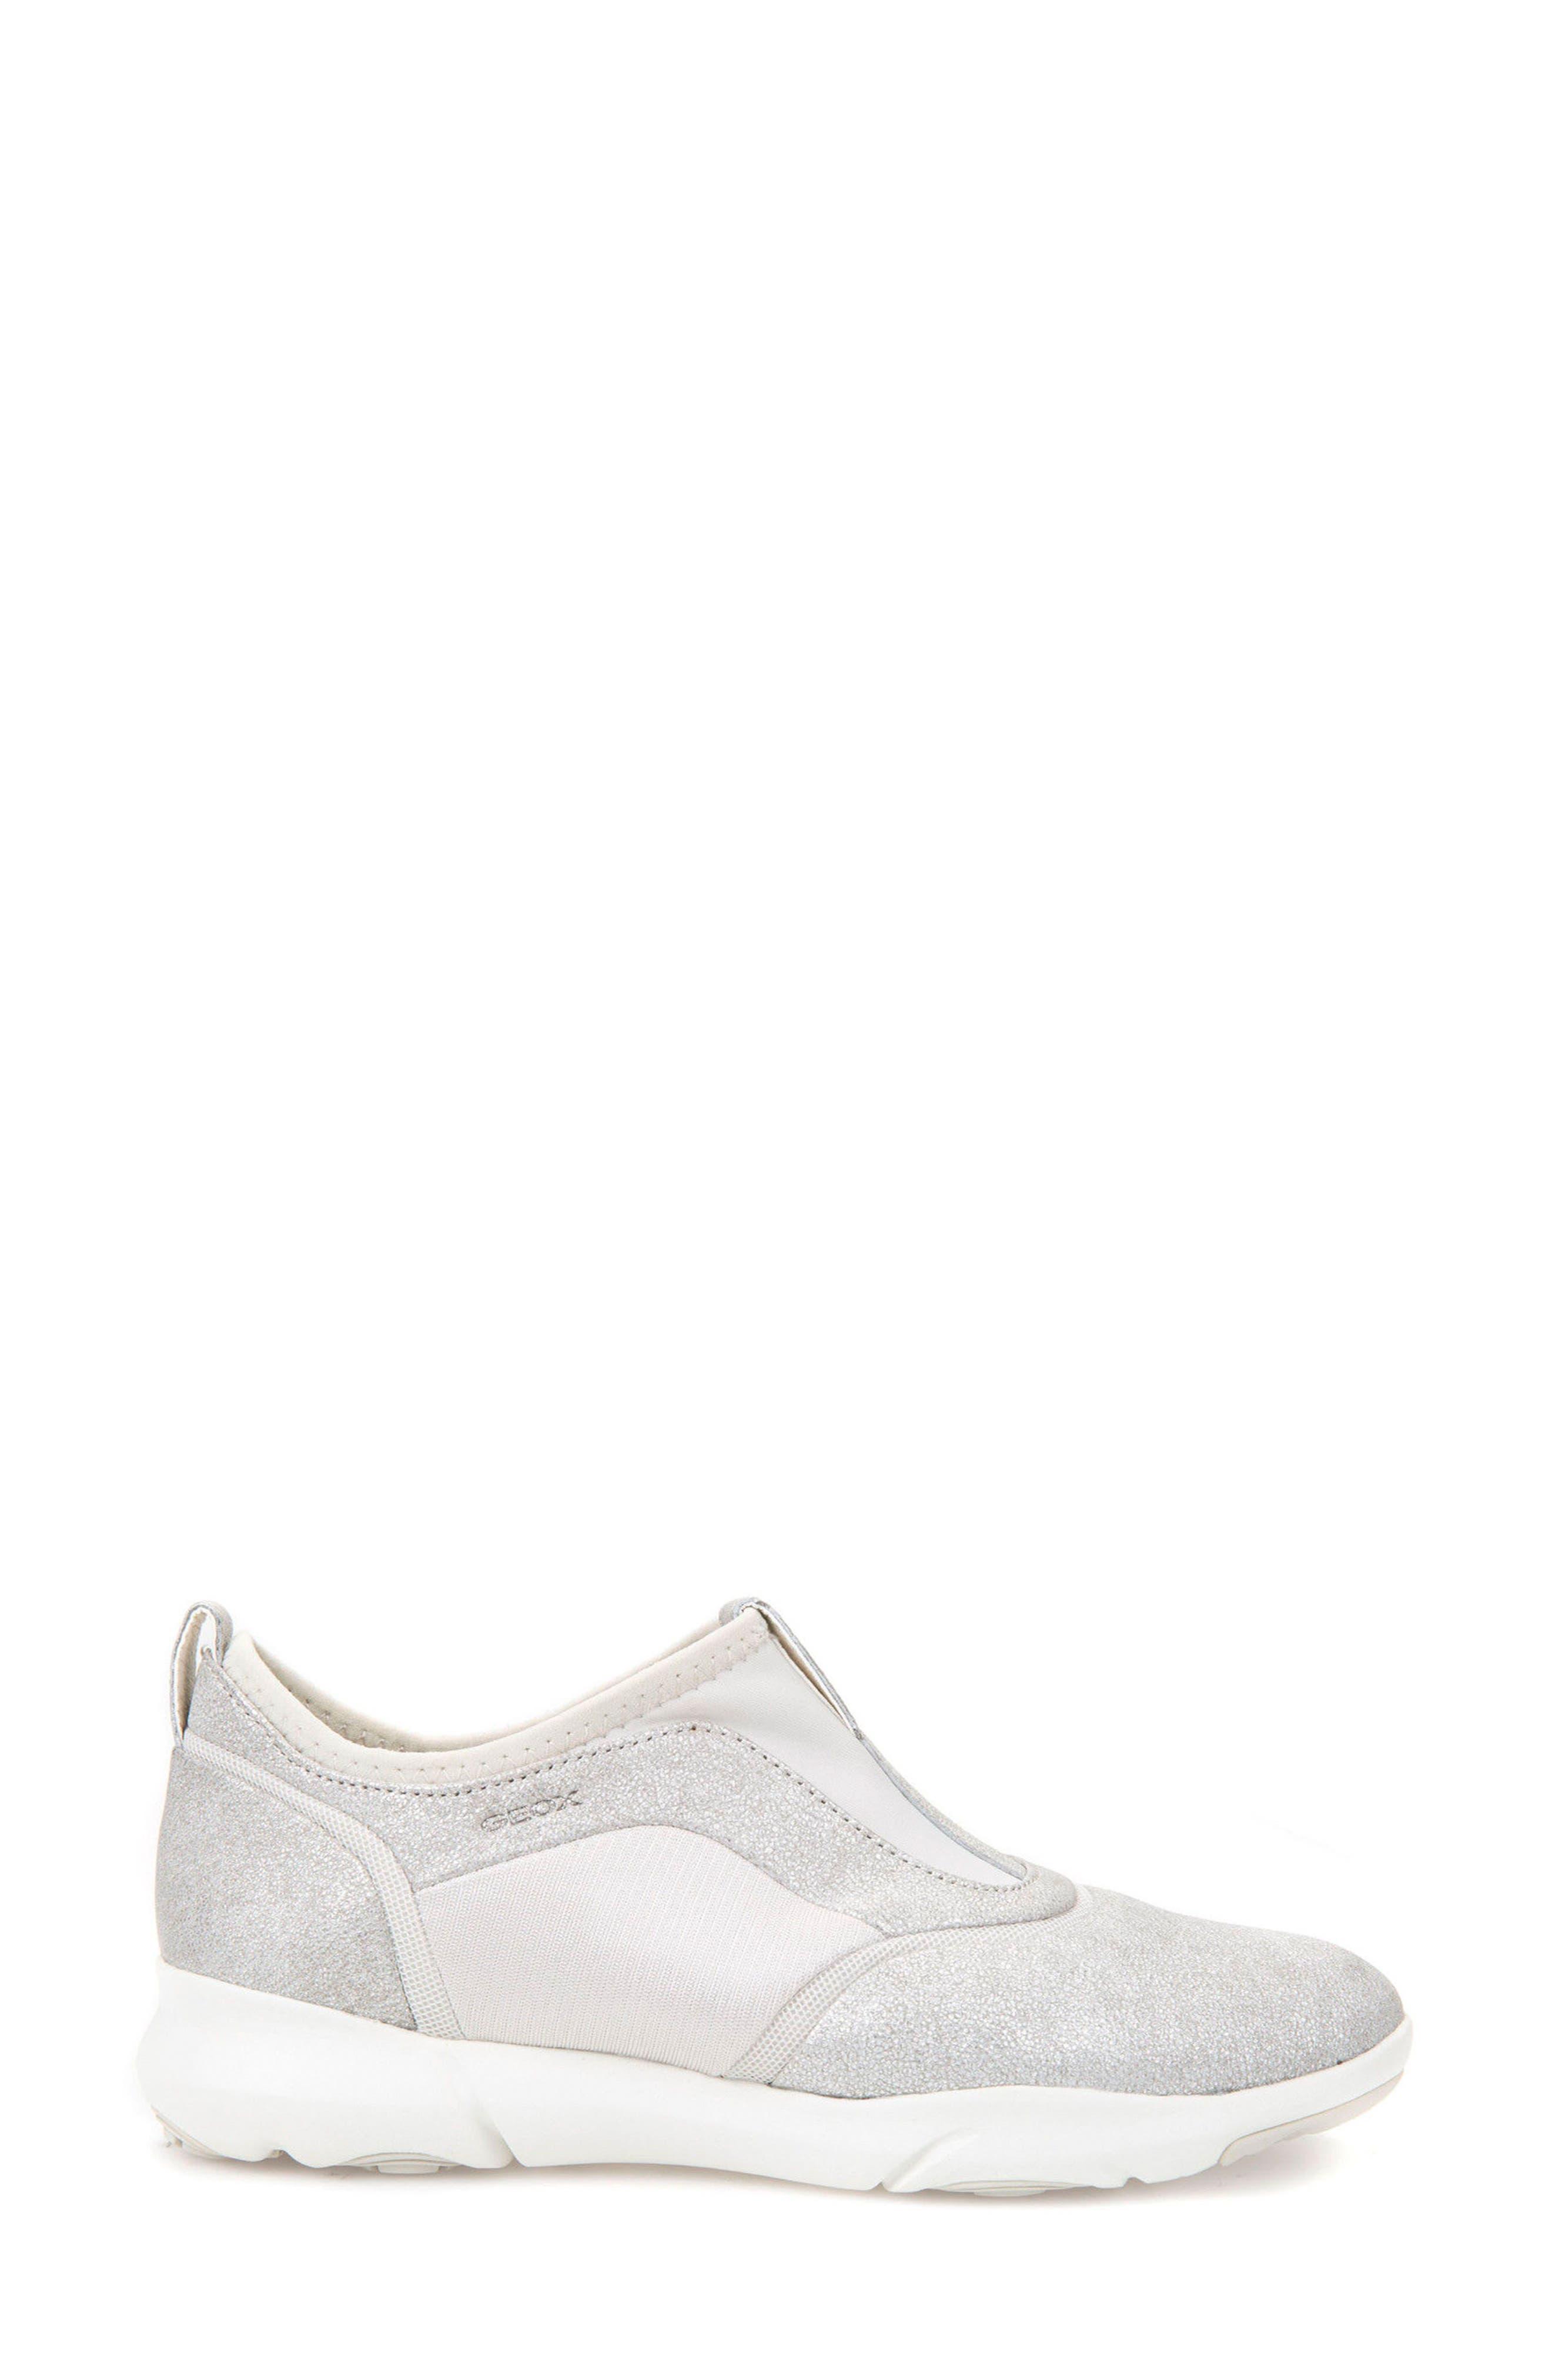 Nebula S Slip-On Sneaker,                             Alternate thumbnail 3, color,                             SILVER LEATHER